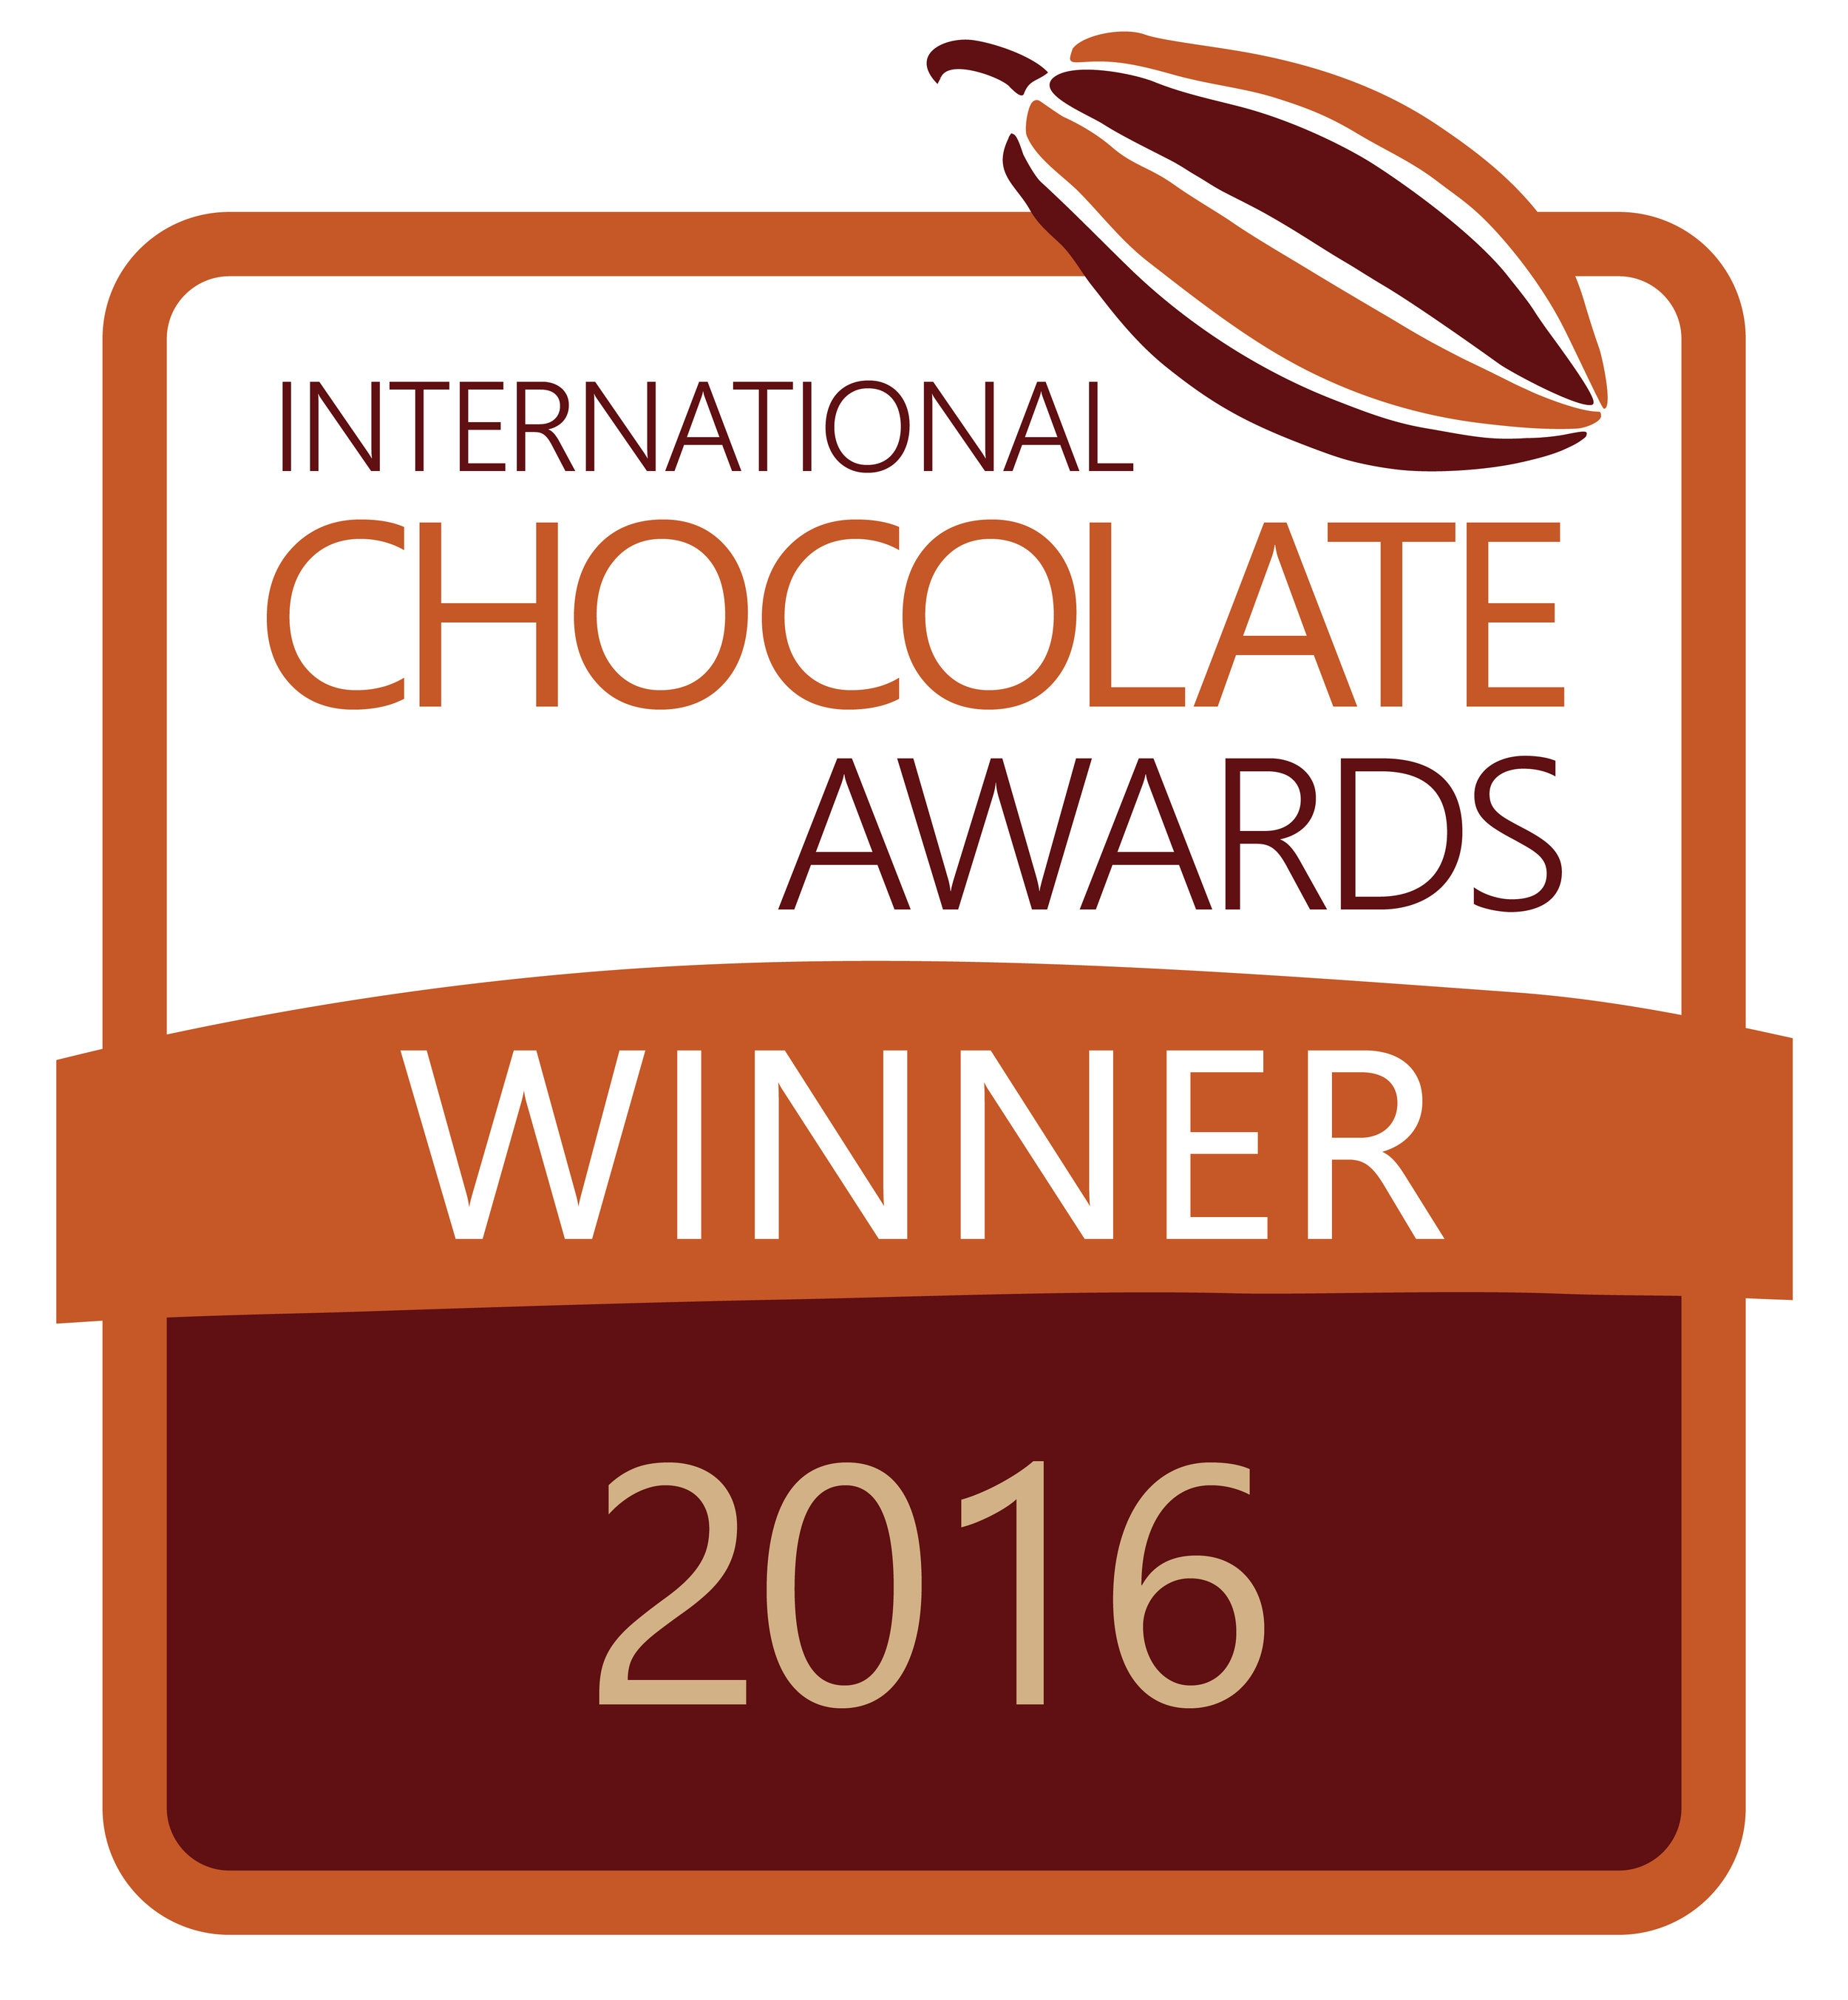 2016 World Final Silver Winner International Chocolate Awards